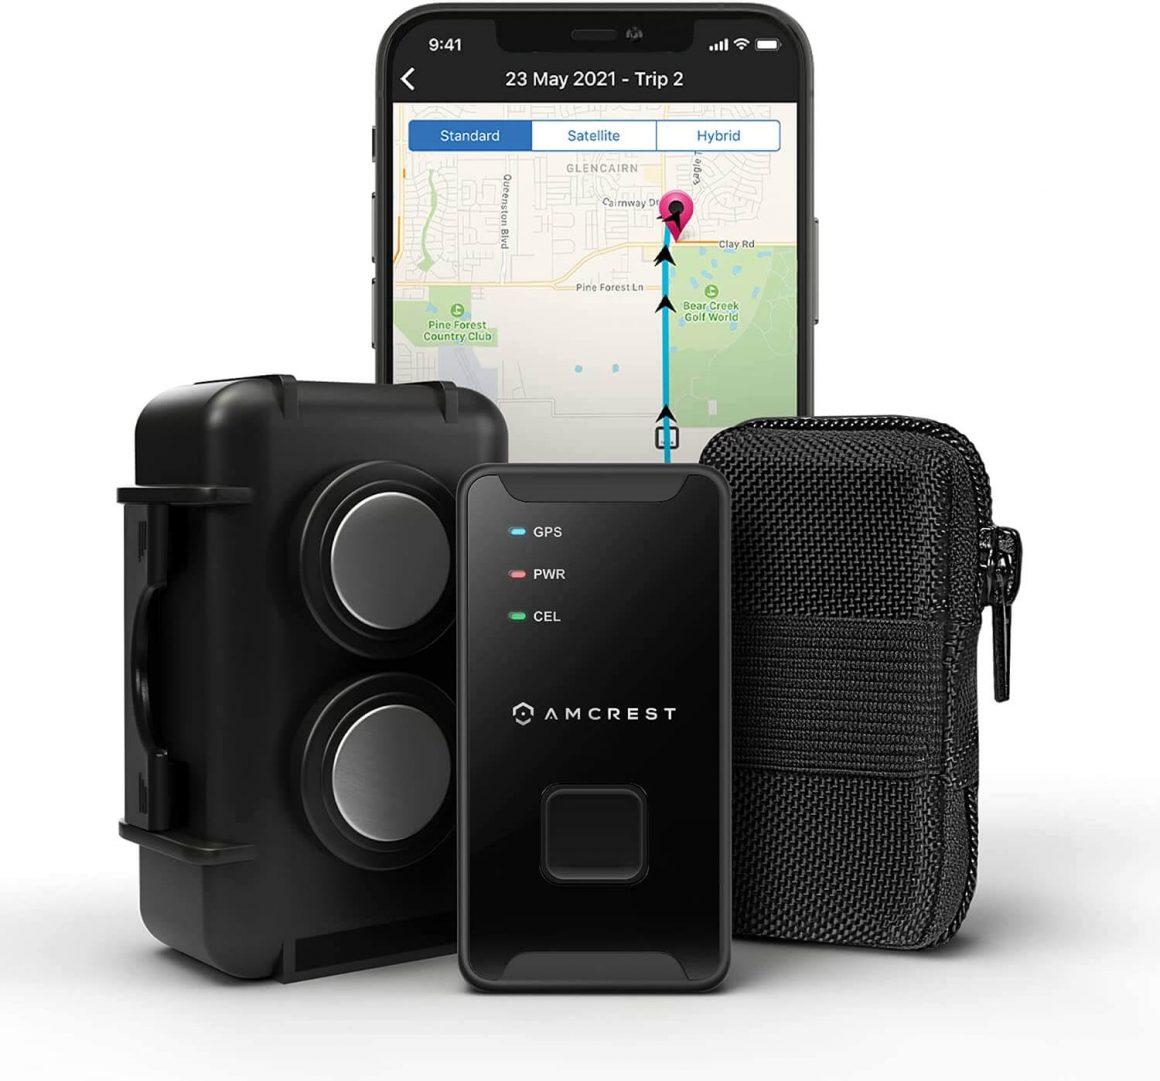 Amcrest GPS